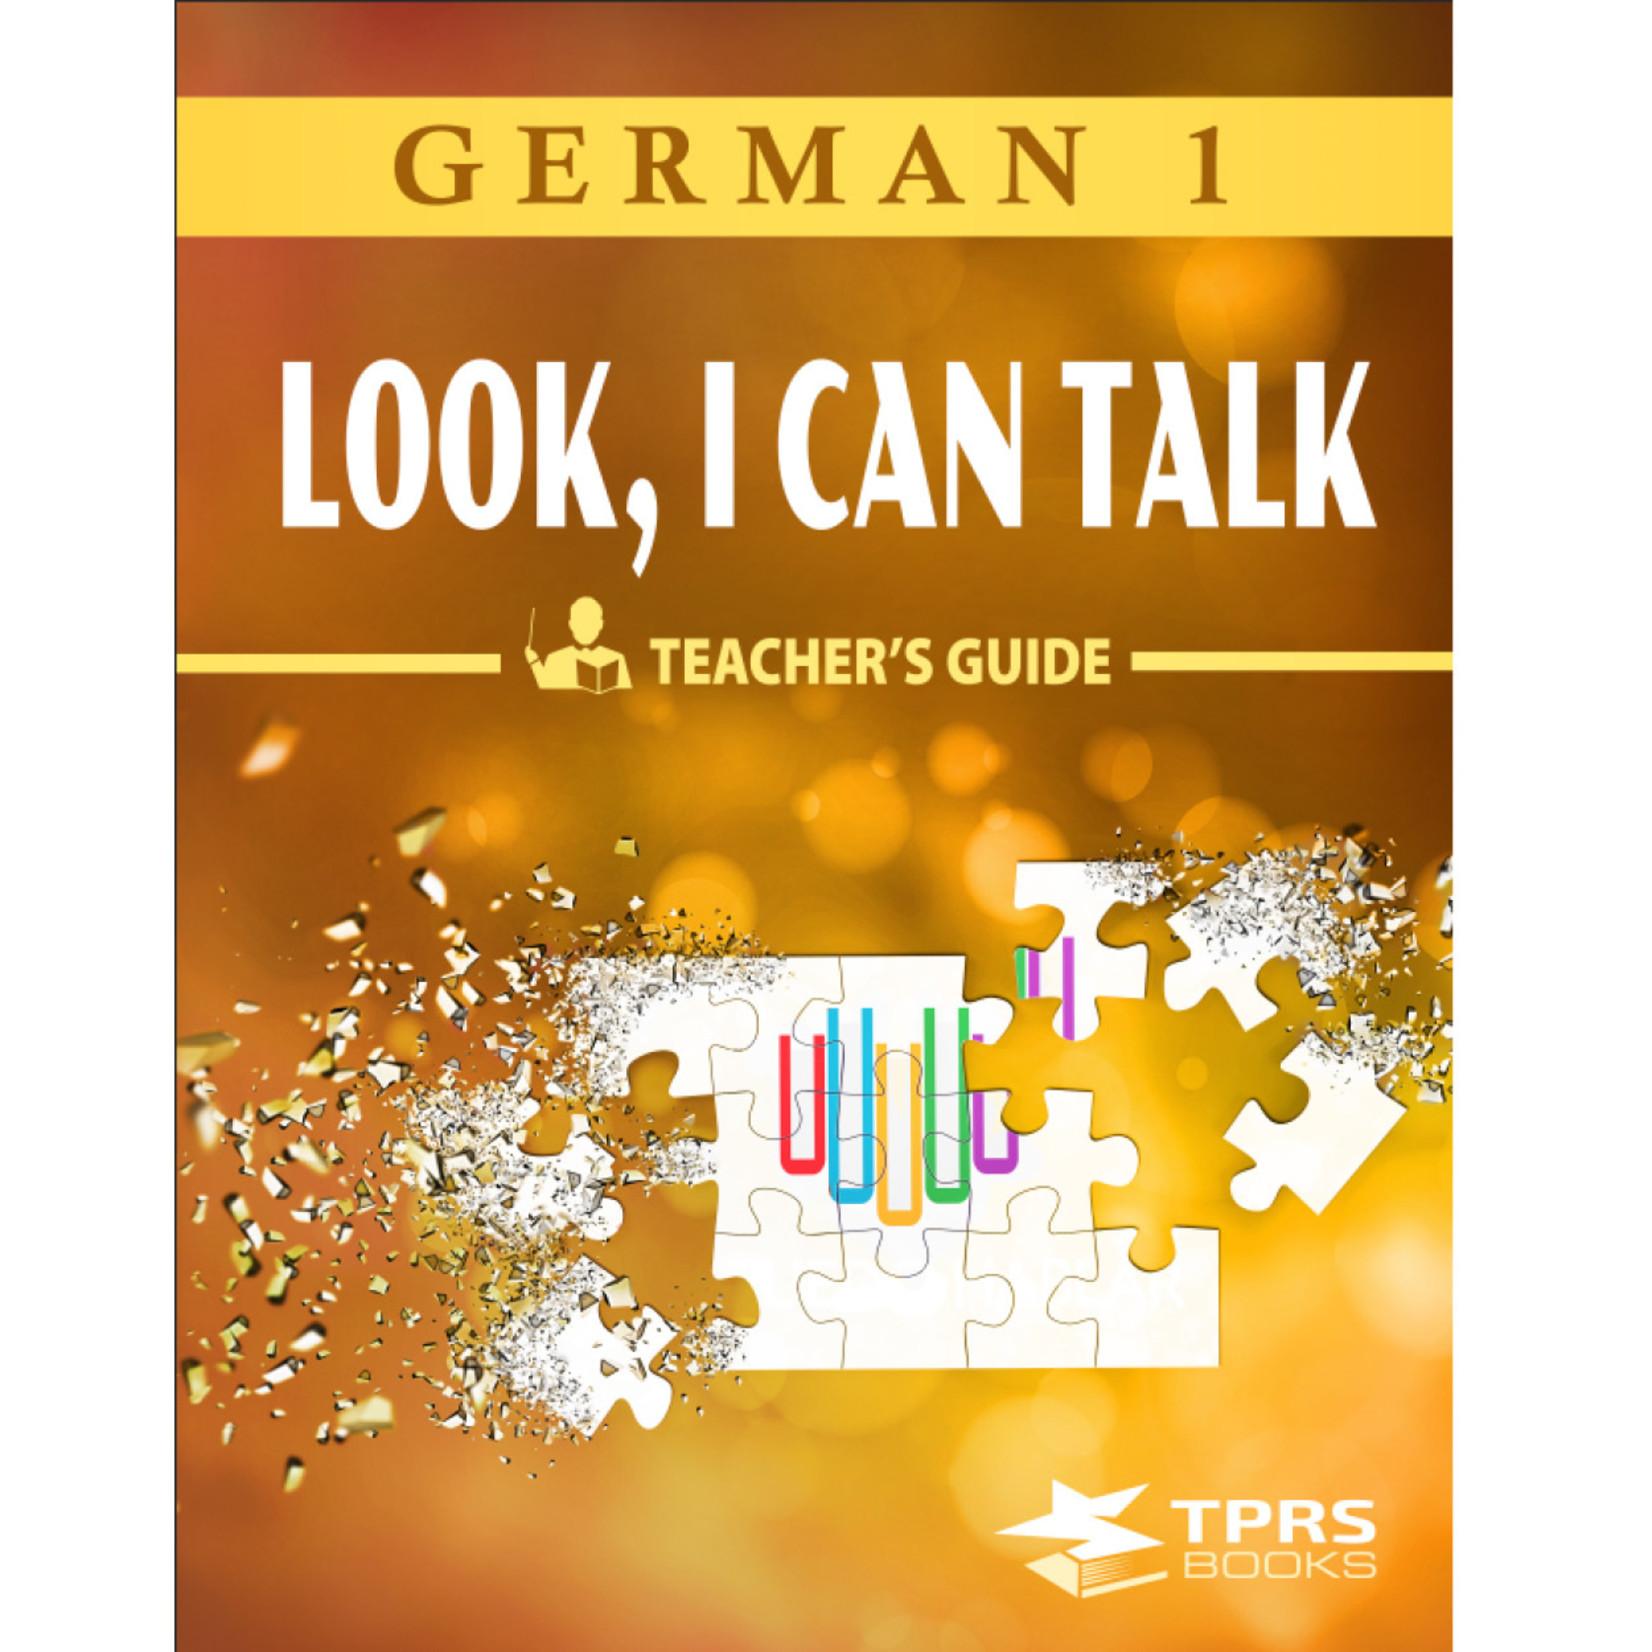 TPRS Books German 1 - Look, I can talk! Teacher's Guide